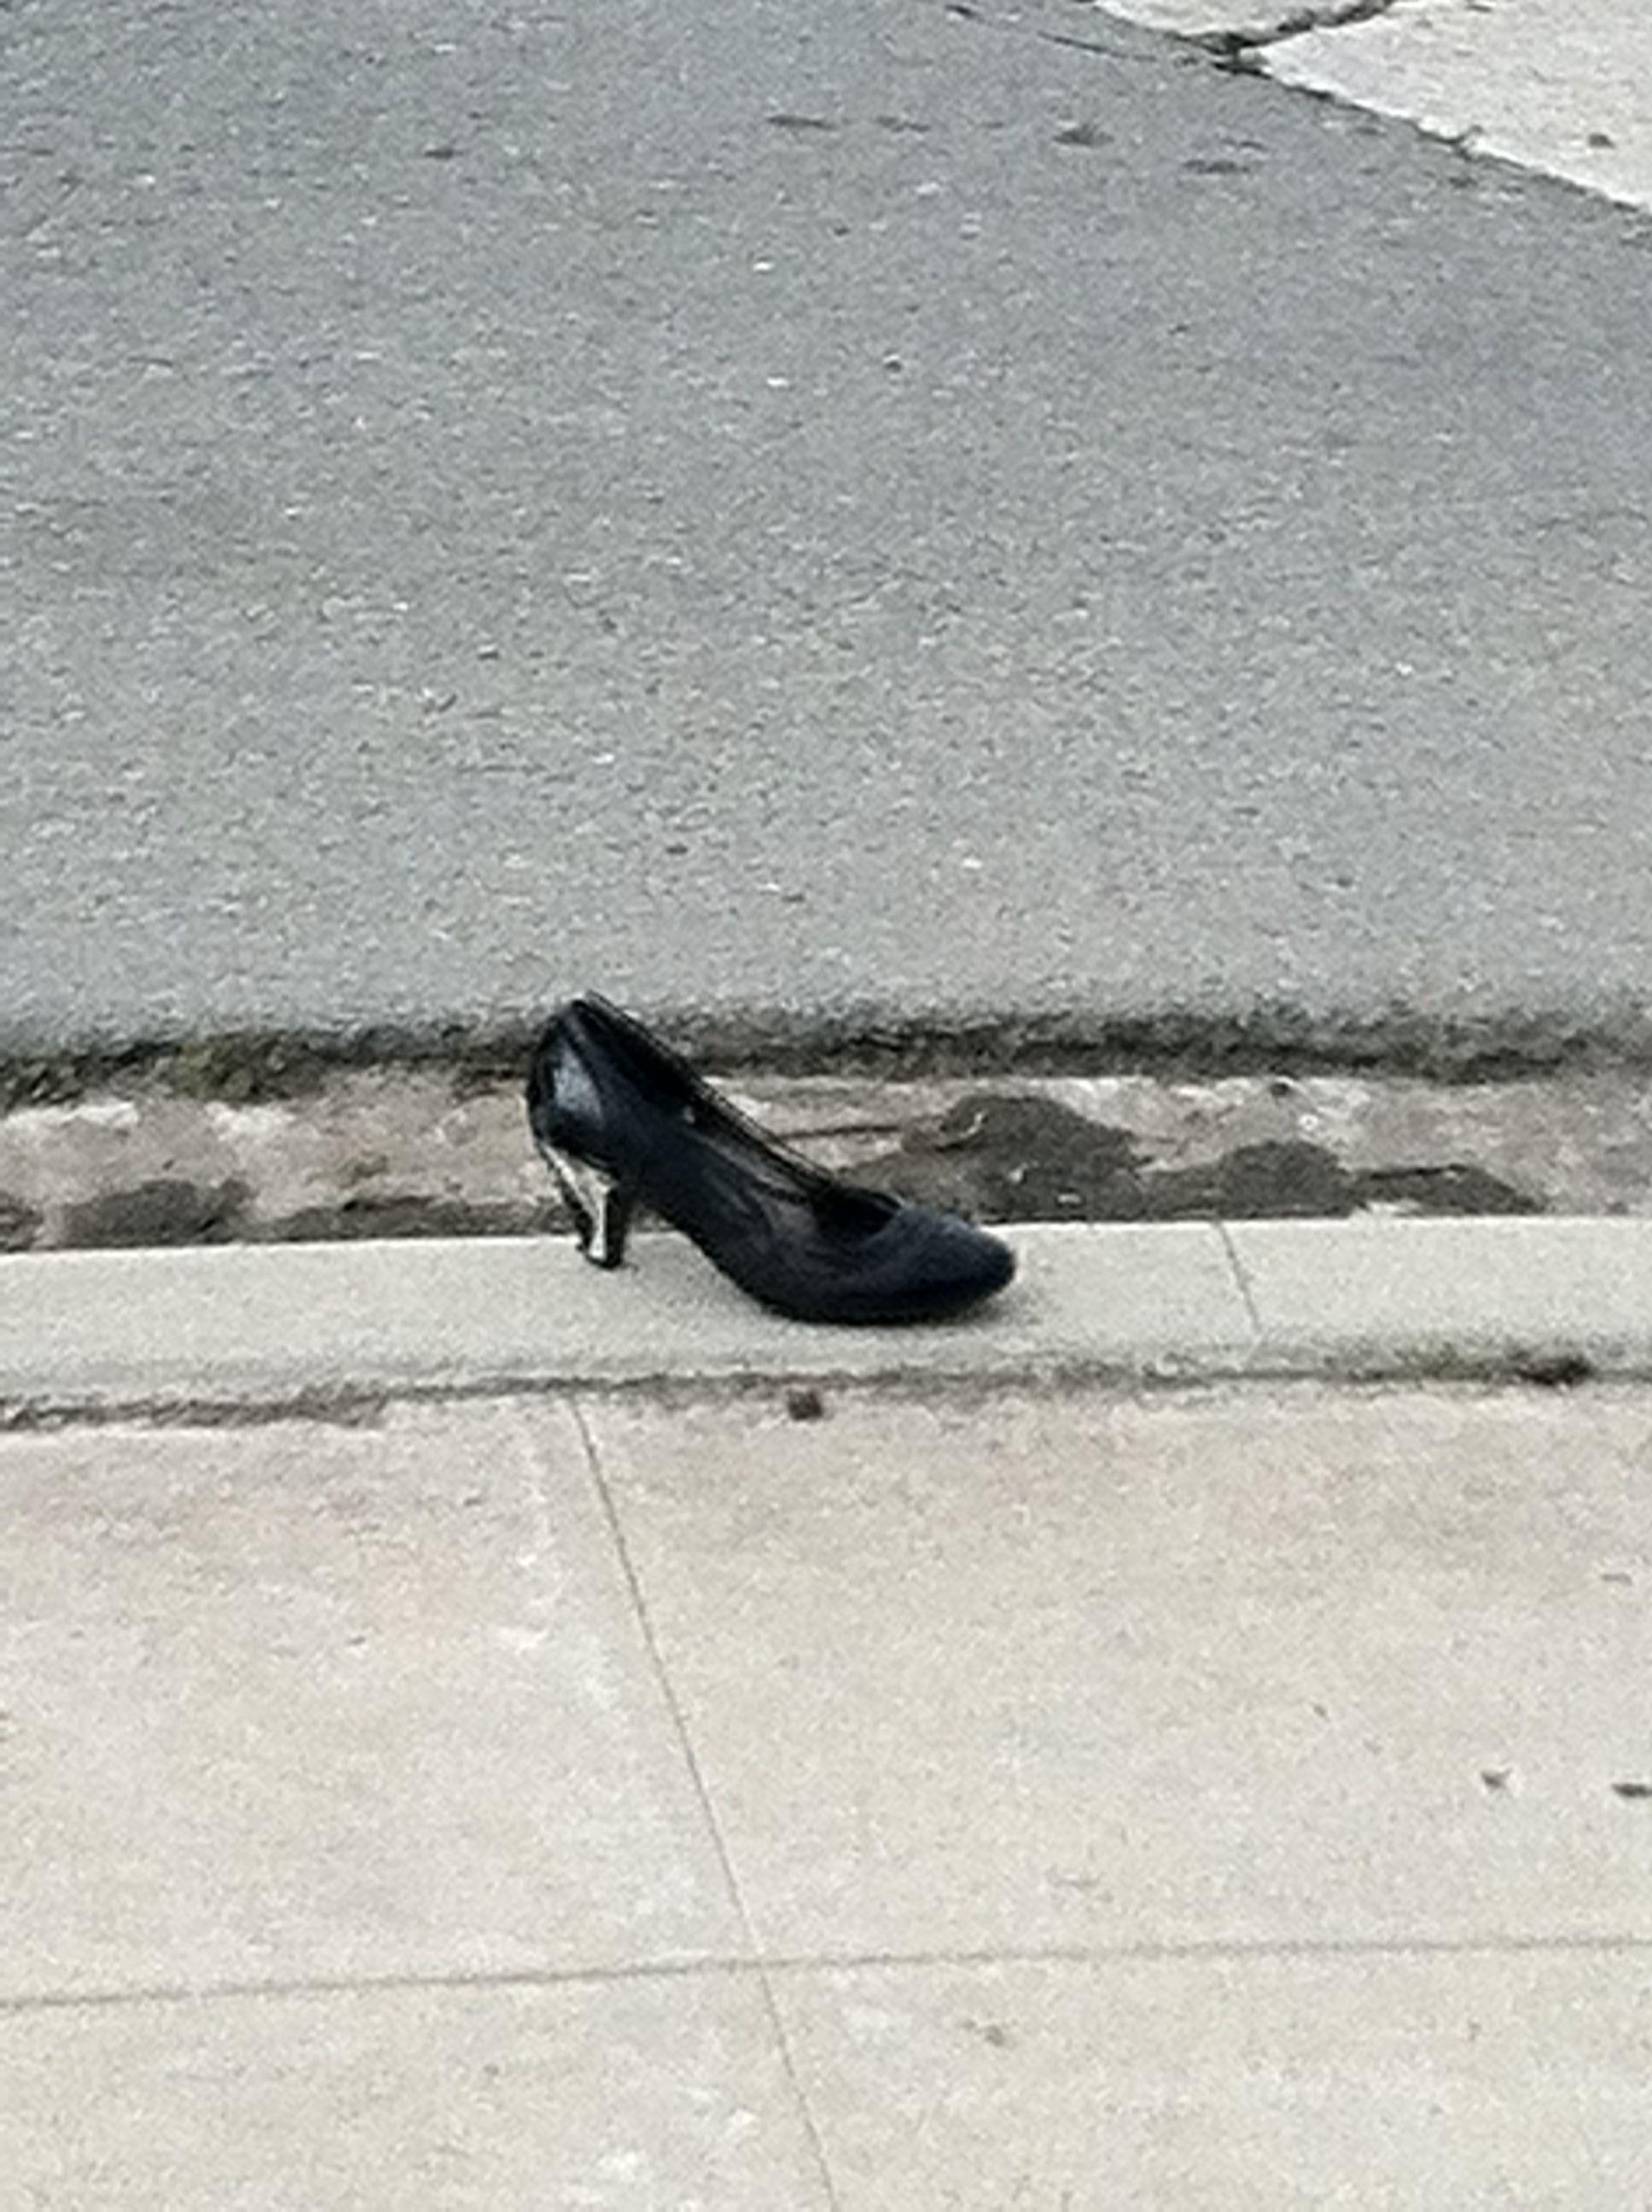 Random shoe on the curb